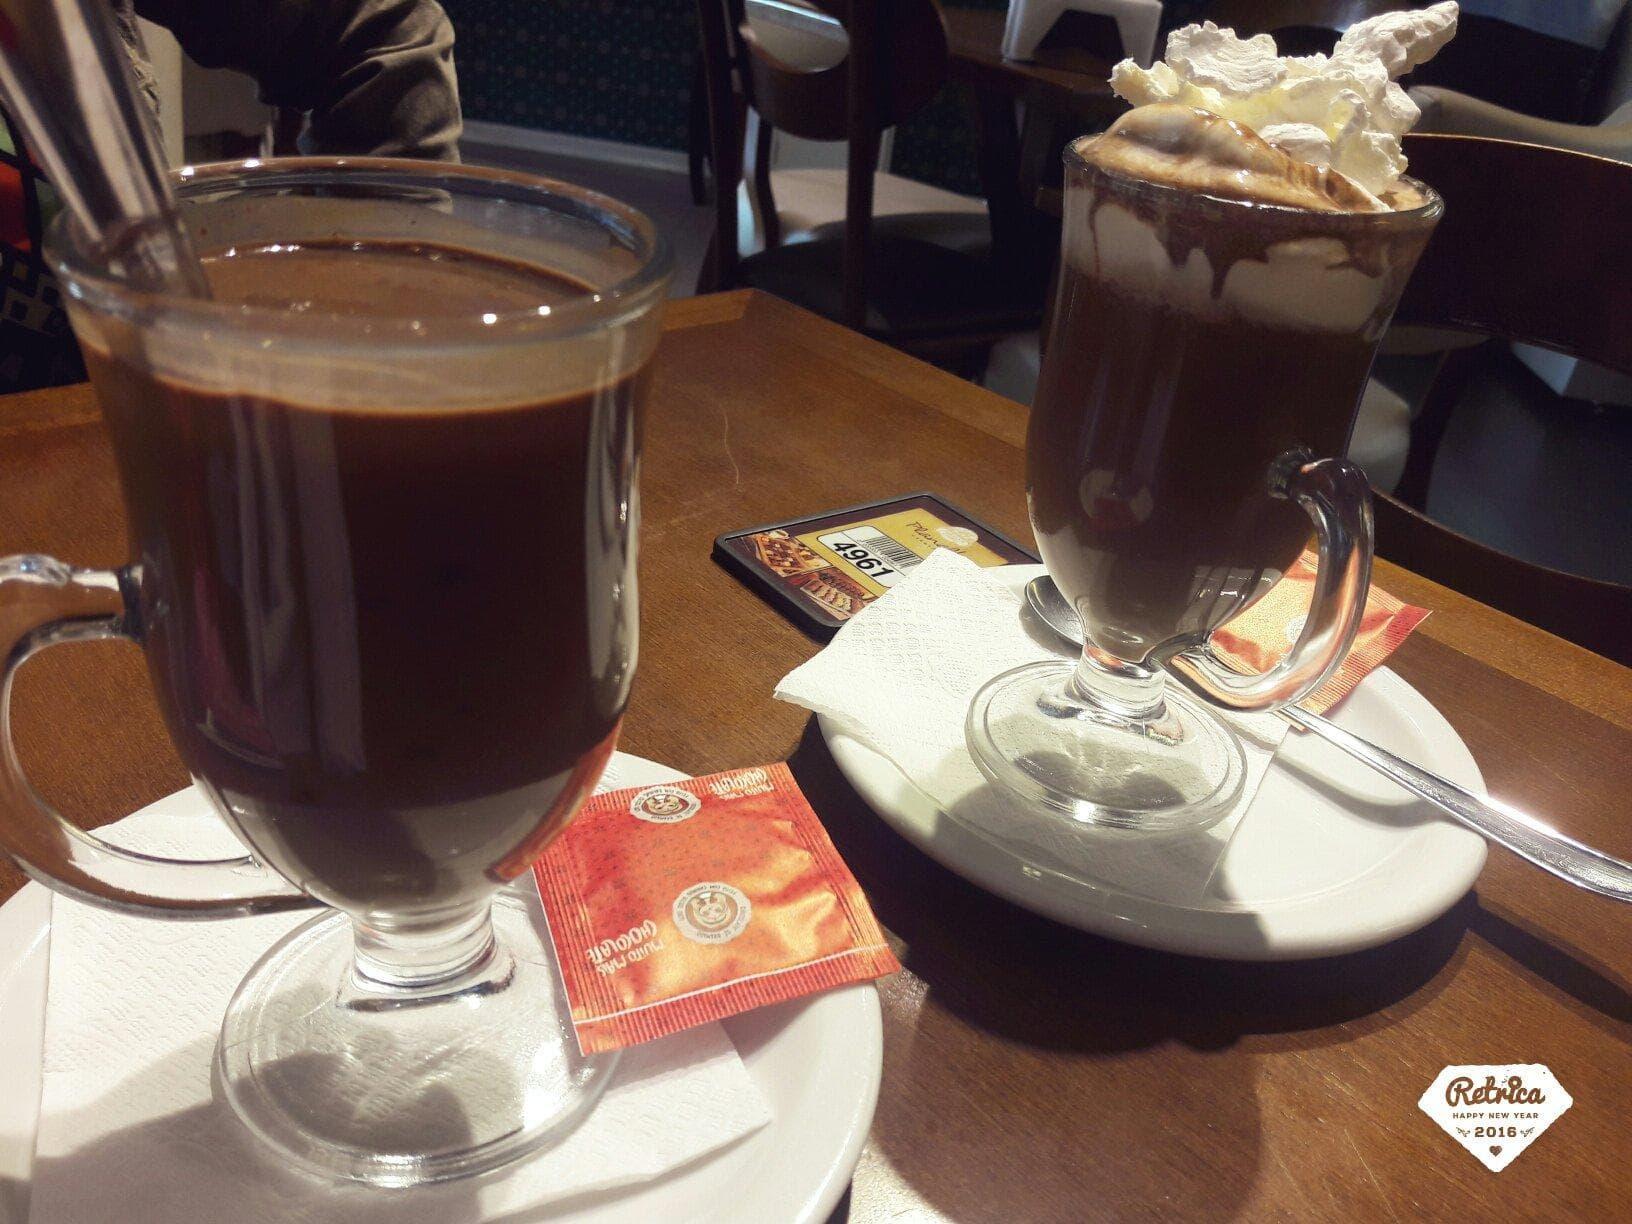 Chocolate Planalt